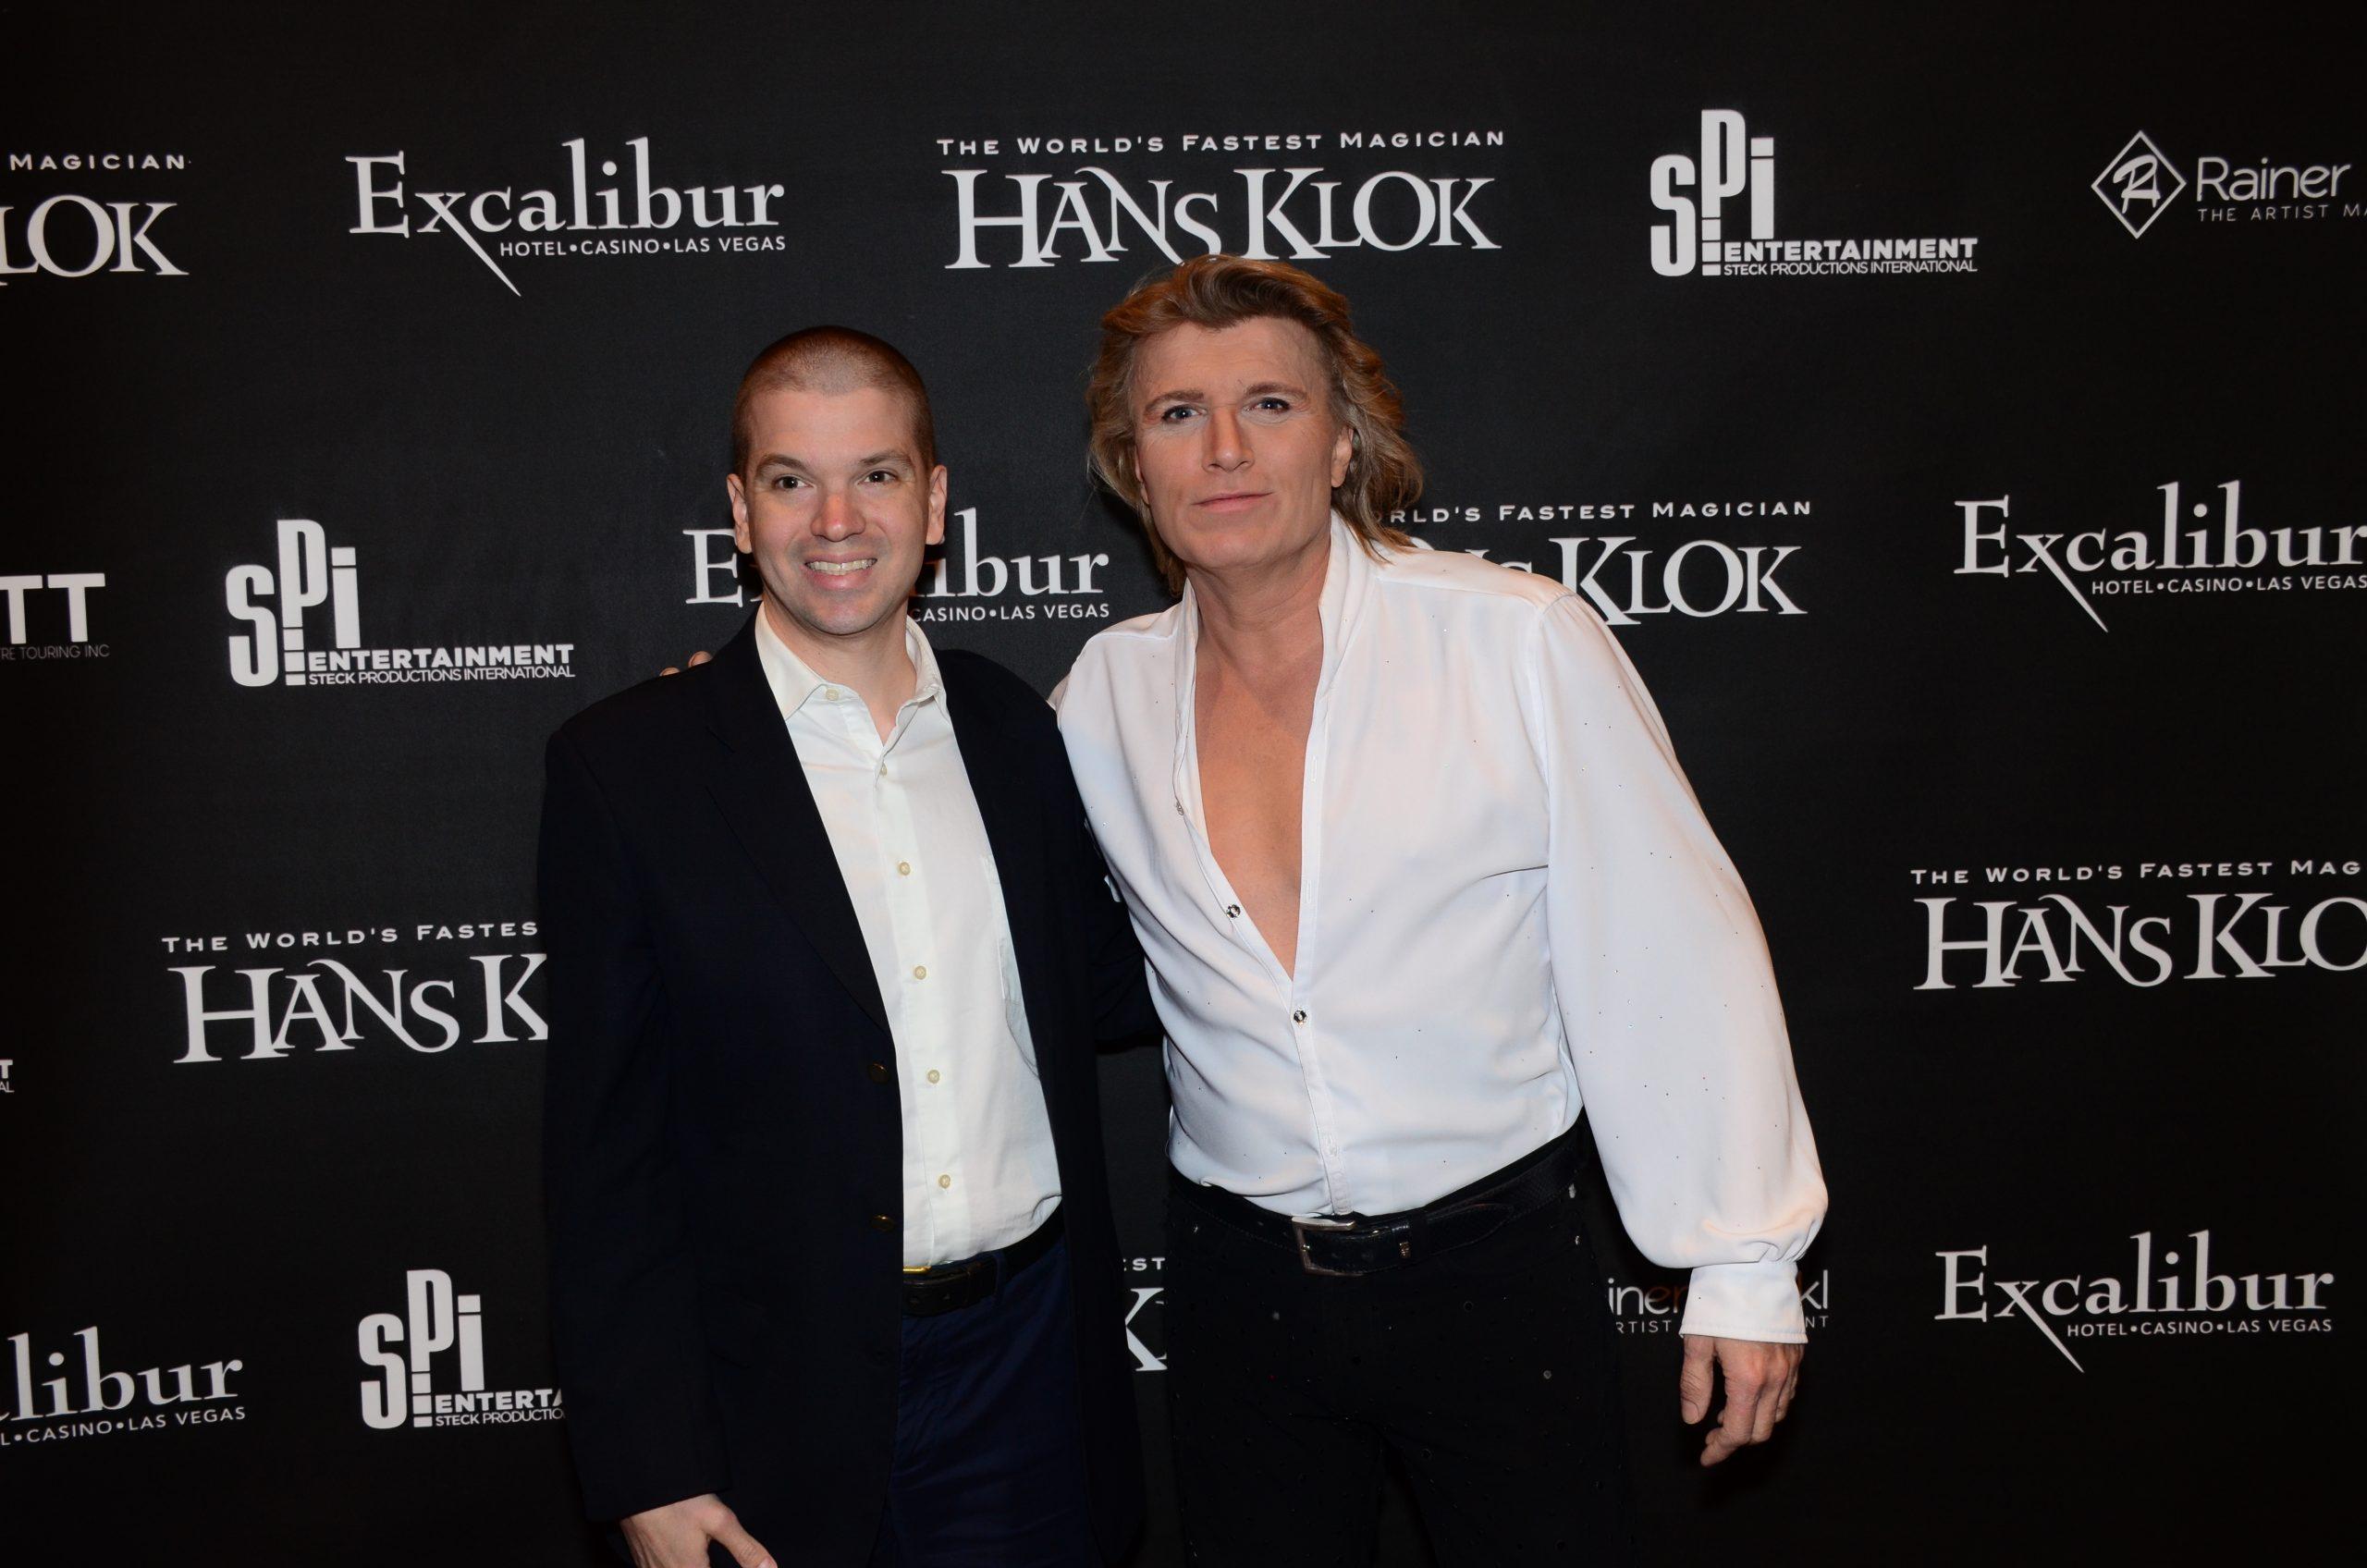 Chris Yandek, Hans Klok 2019, Hans Klok Las Vegas, Hans Klok Las Vegas Show, Hans Klok Excalibur, Hans Klok Christmas Show, Chris Yandek